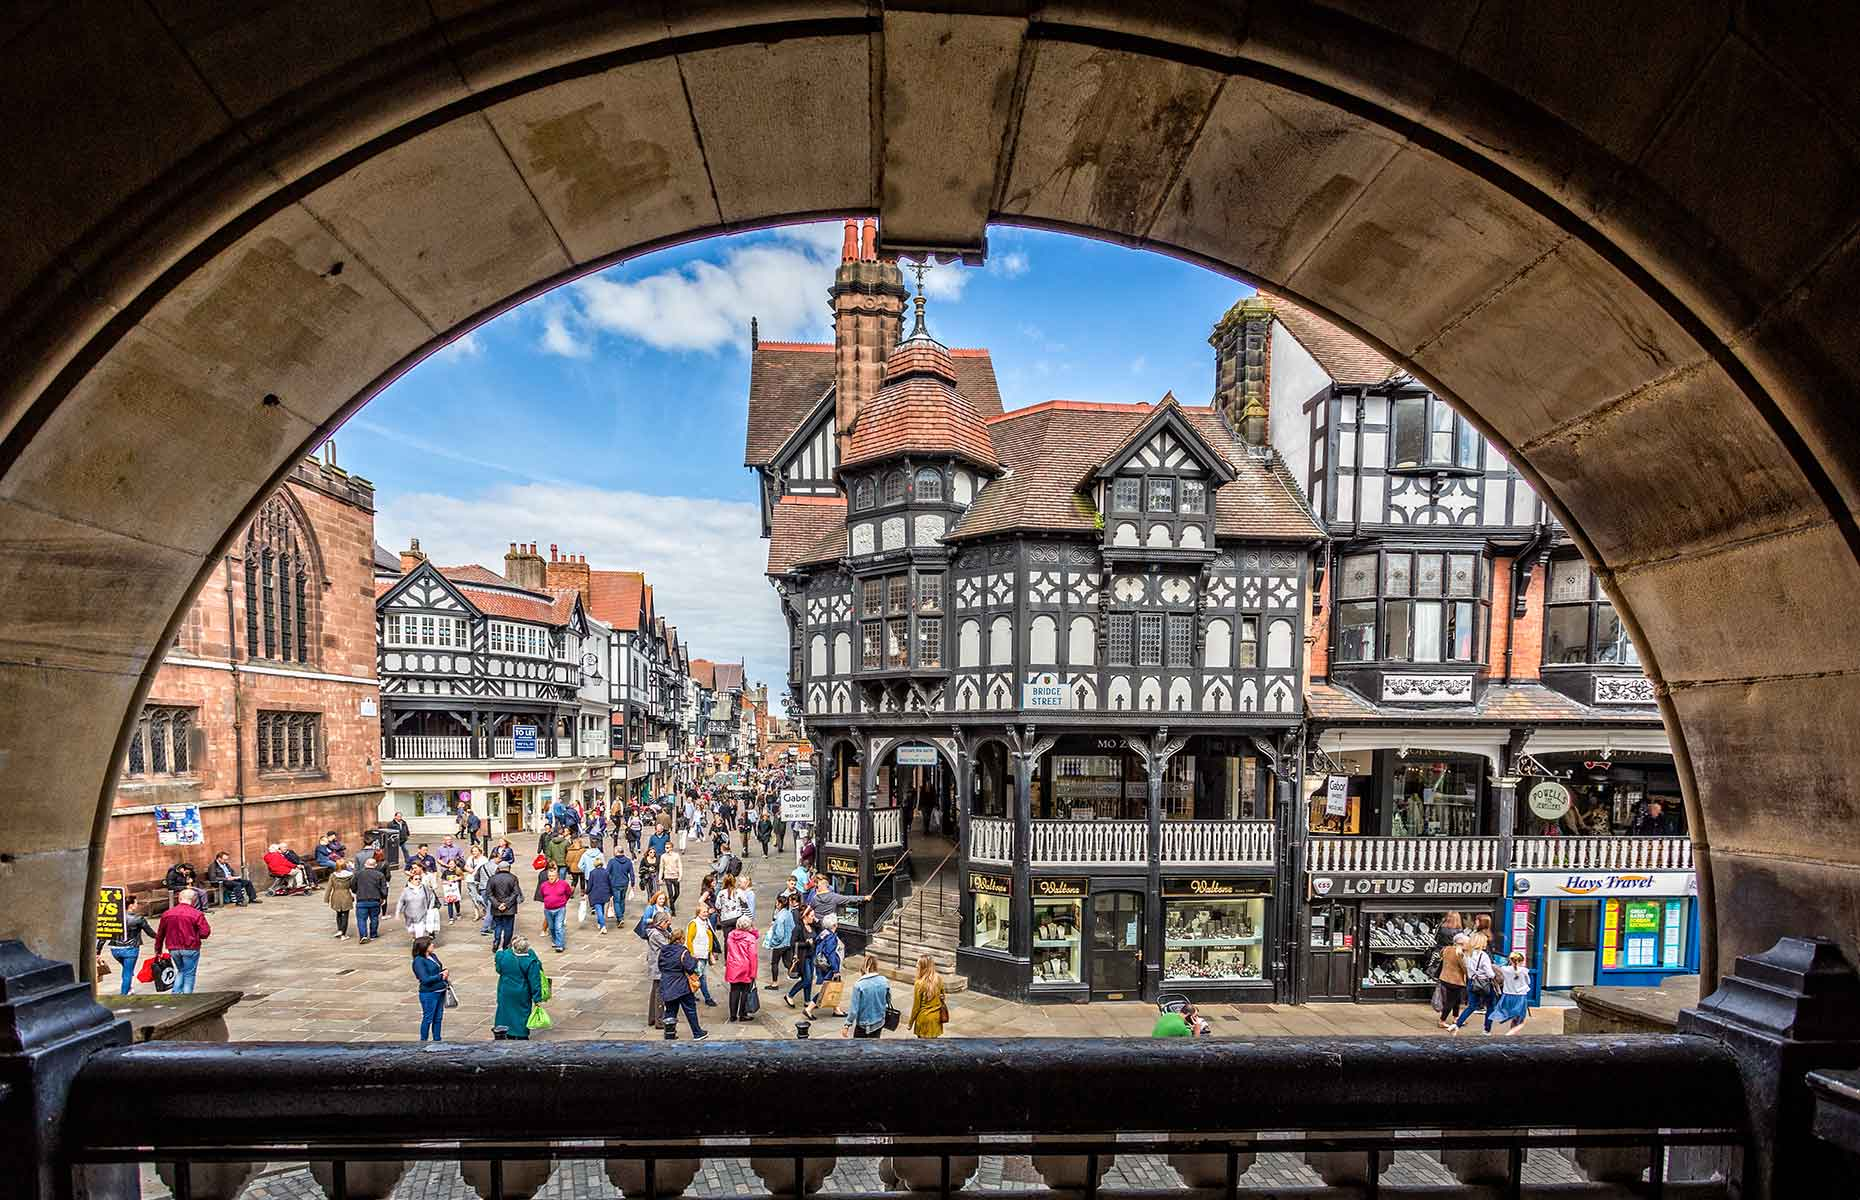 Chester (Image: Nigel Jarvis/Shutterstock)